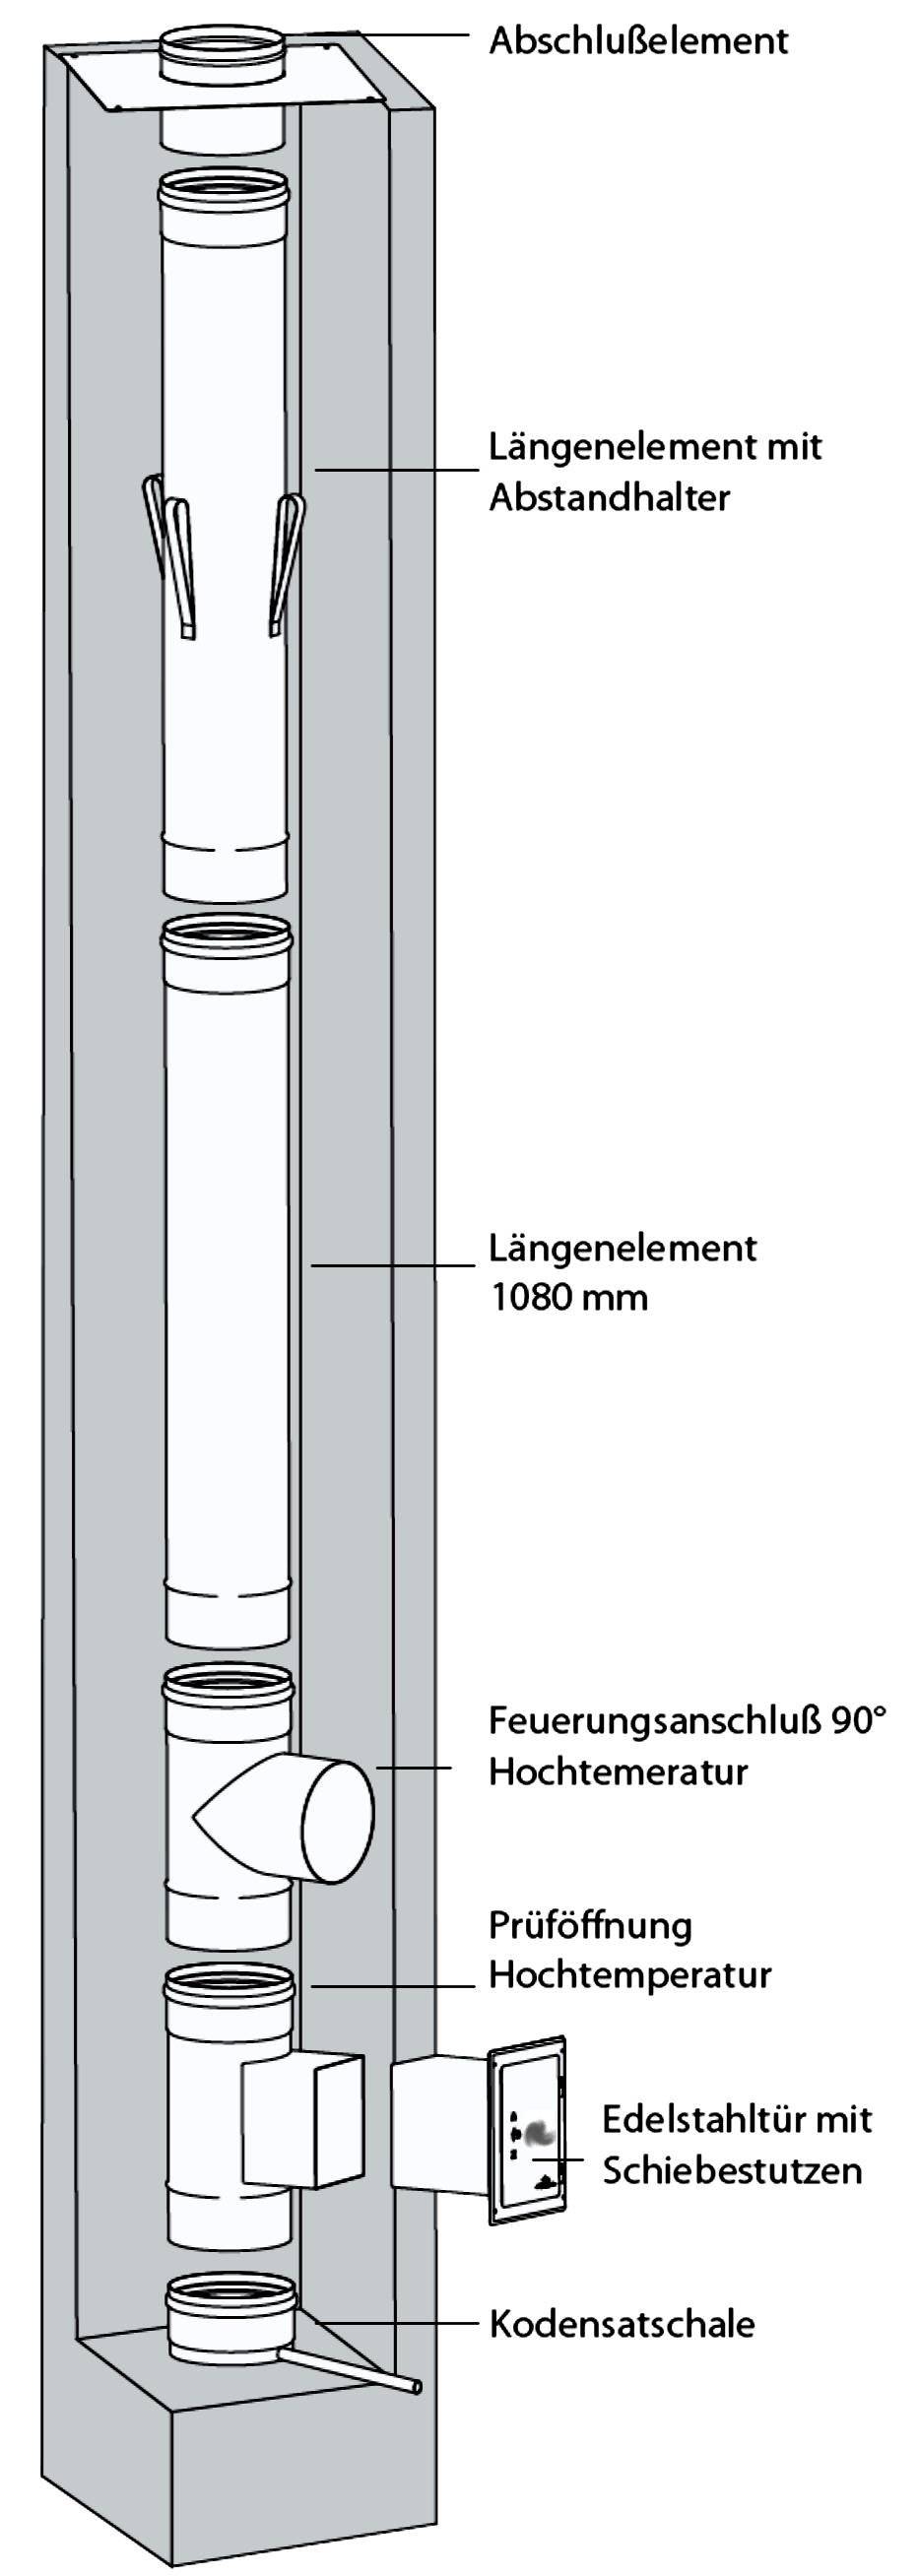 Einzugschornstein-Edelstahl Killus-Technik.de